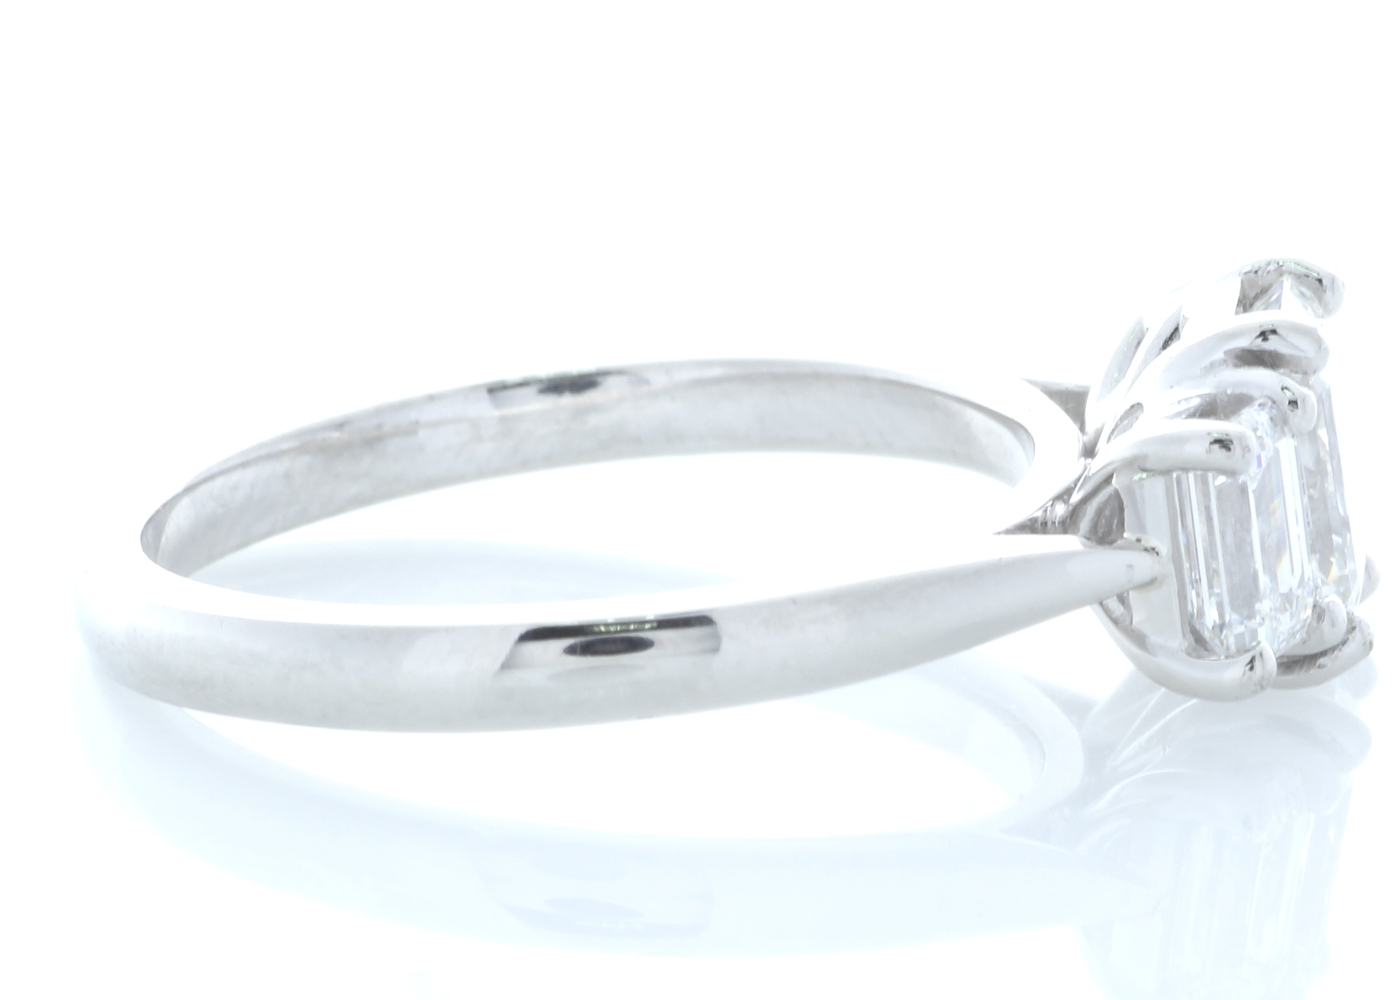 Platinum Three Stone Claw Set Diamond Ring 1.91 Carats - Image 4 of 4